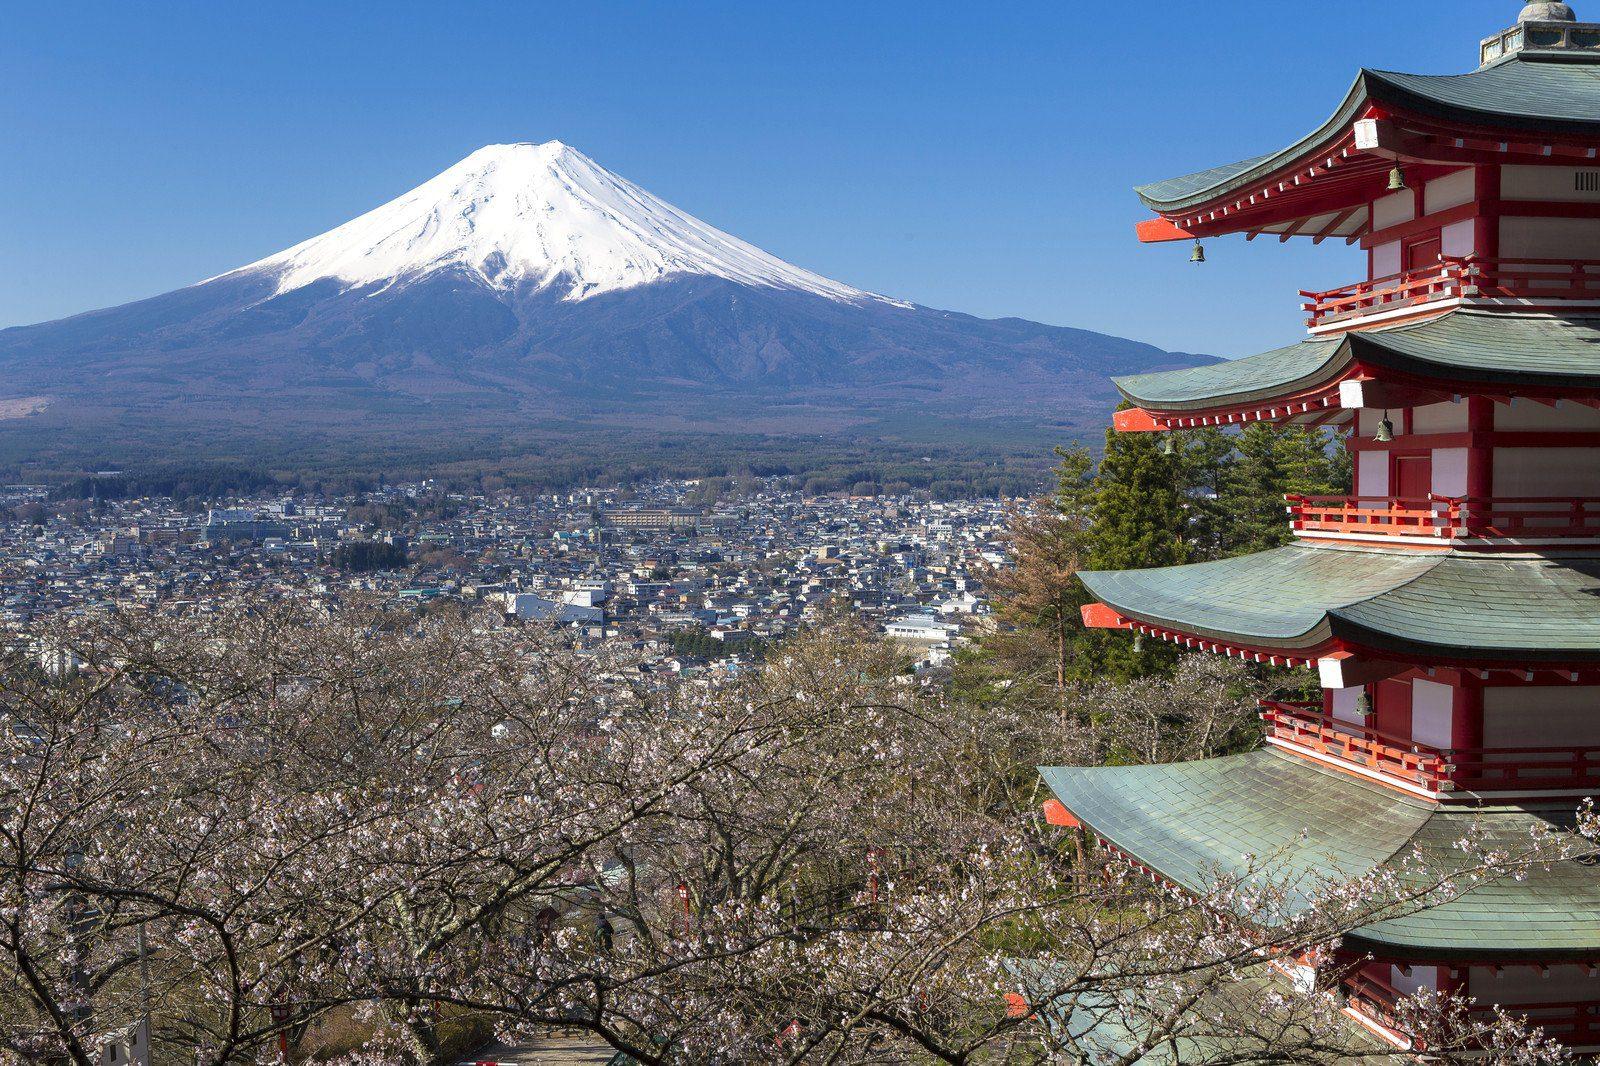 Mt. Fuji viewed from Chureito Pagoda in Japan